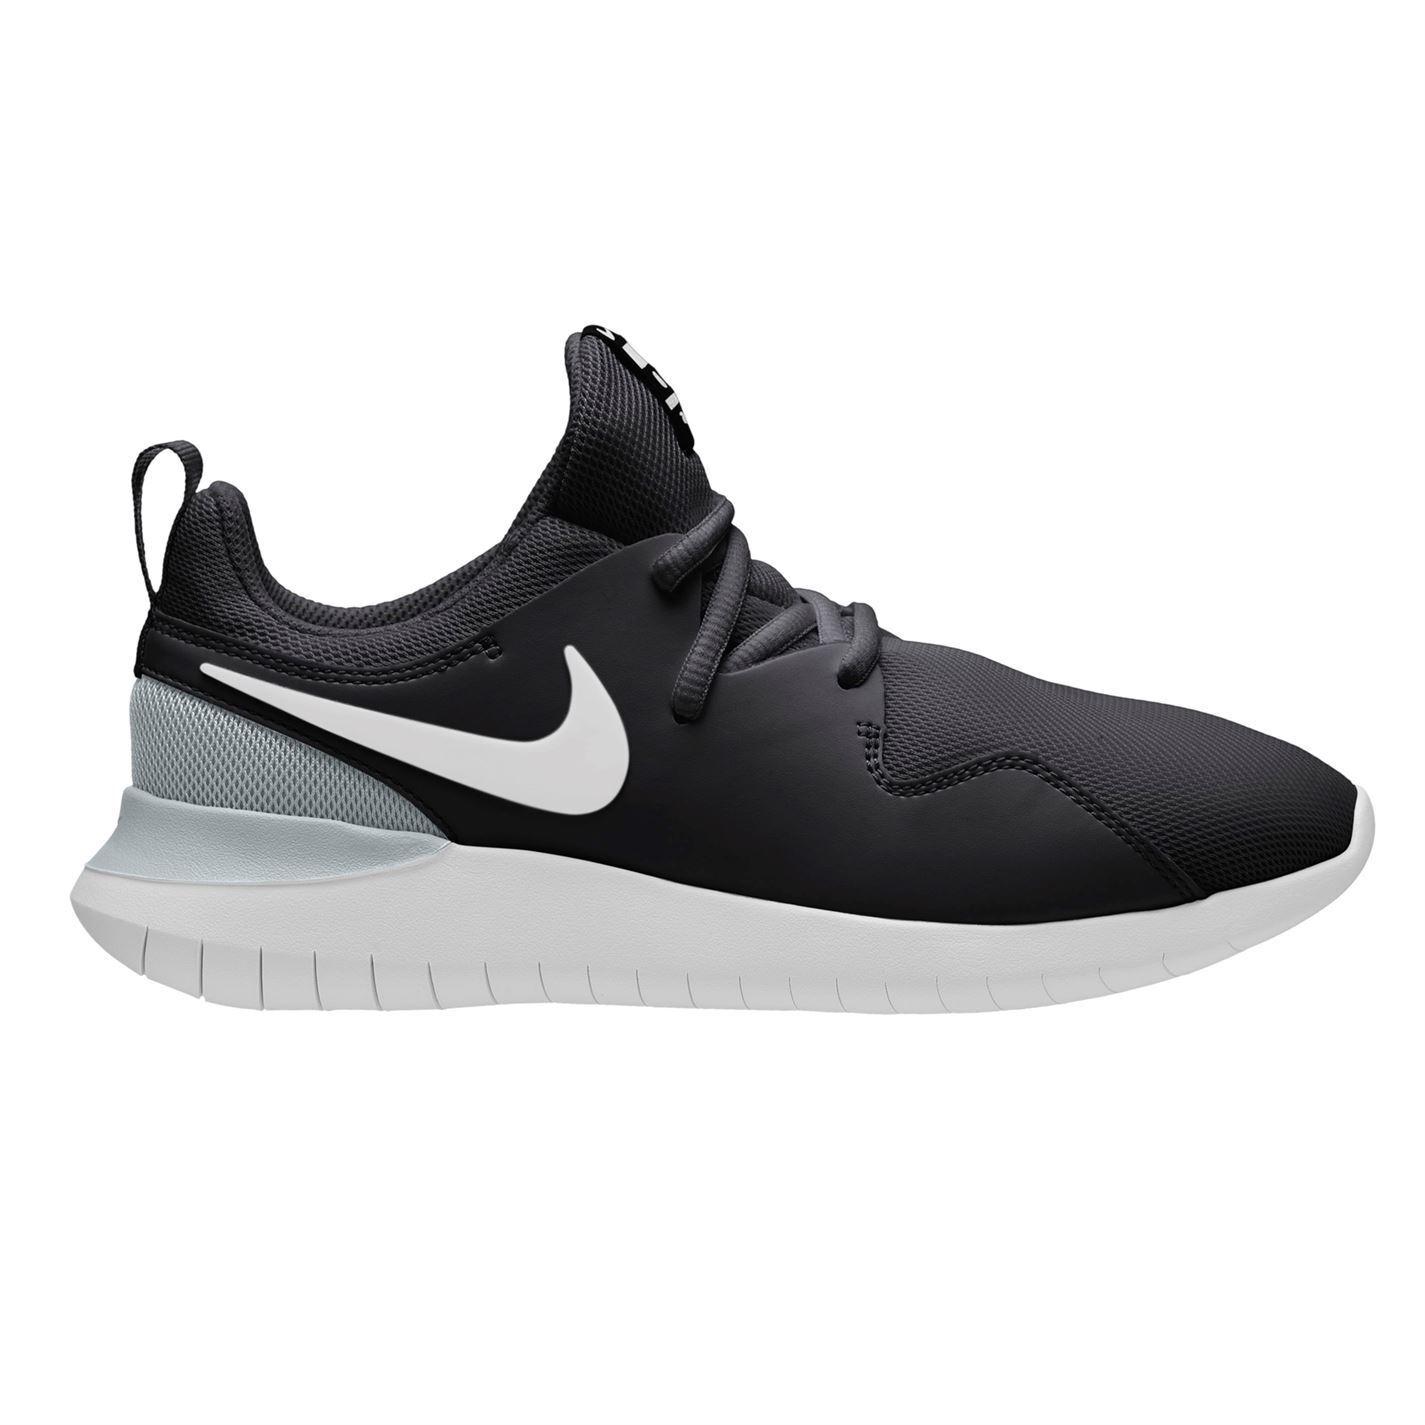 Nike Tessen fonctionnement chaussures - Femme - noir/blanc